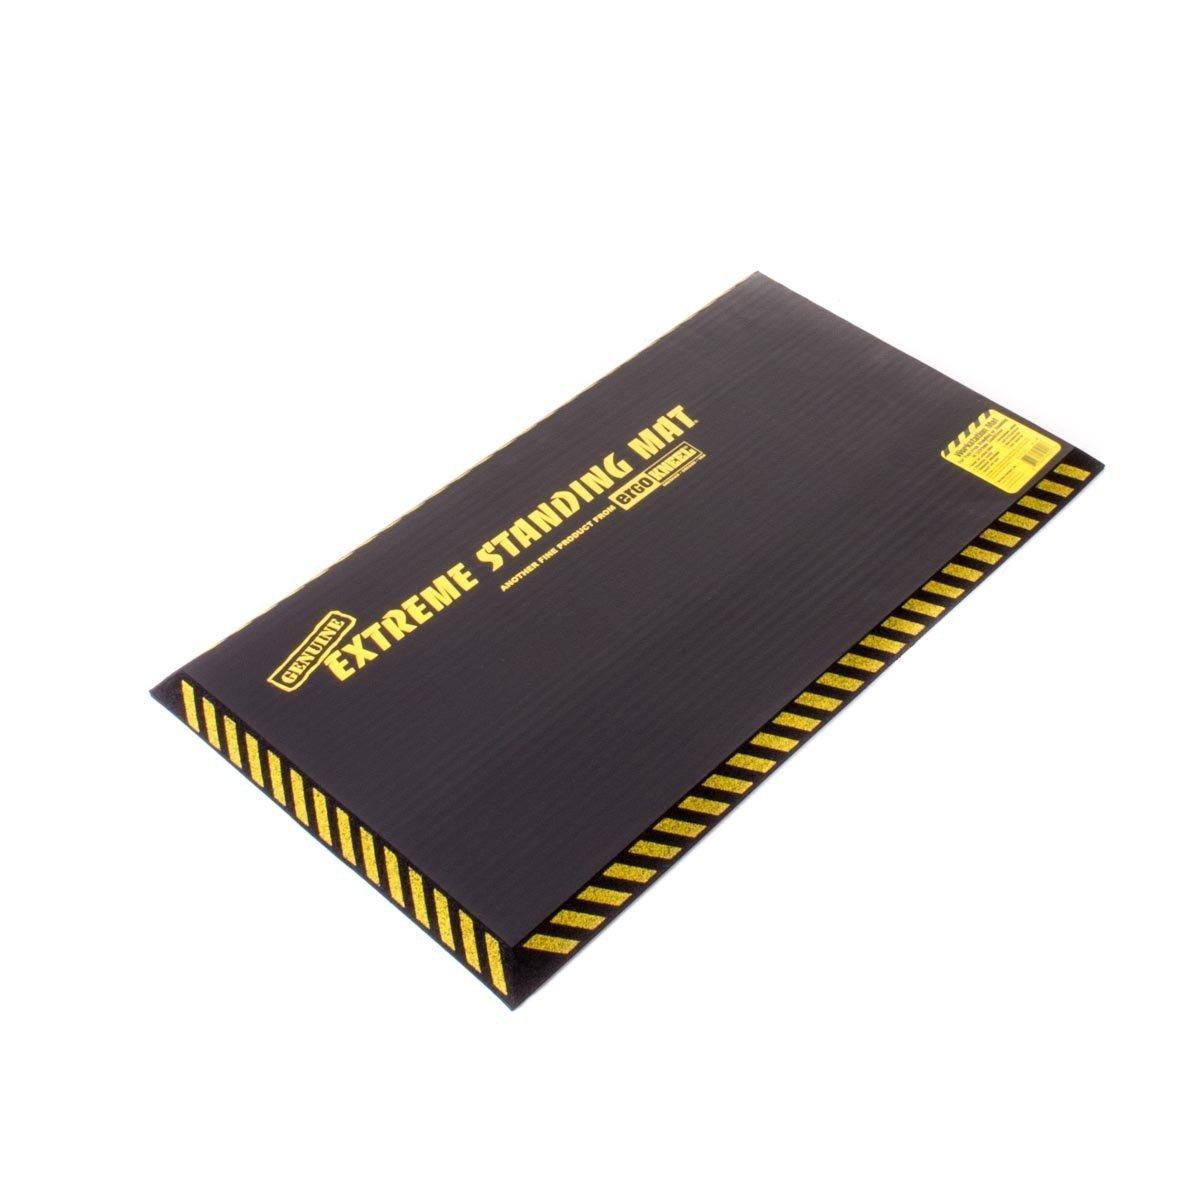 mats foam standing notrax sponge in top mat pvc finish extreme rubber commercial pebble x fatigue anti trafficmaster p vinyl trax black